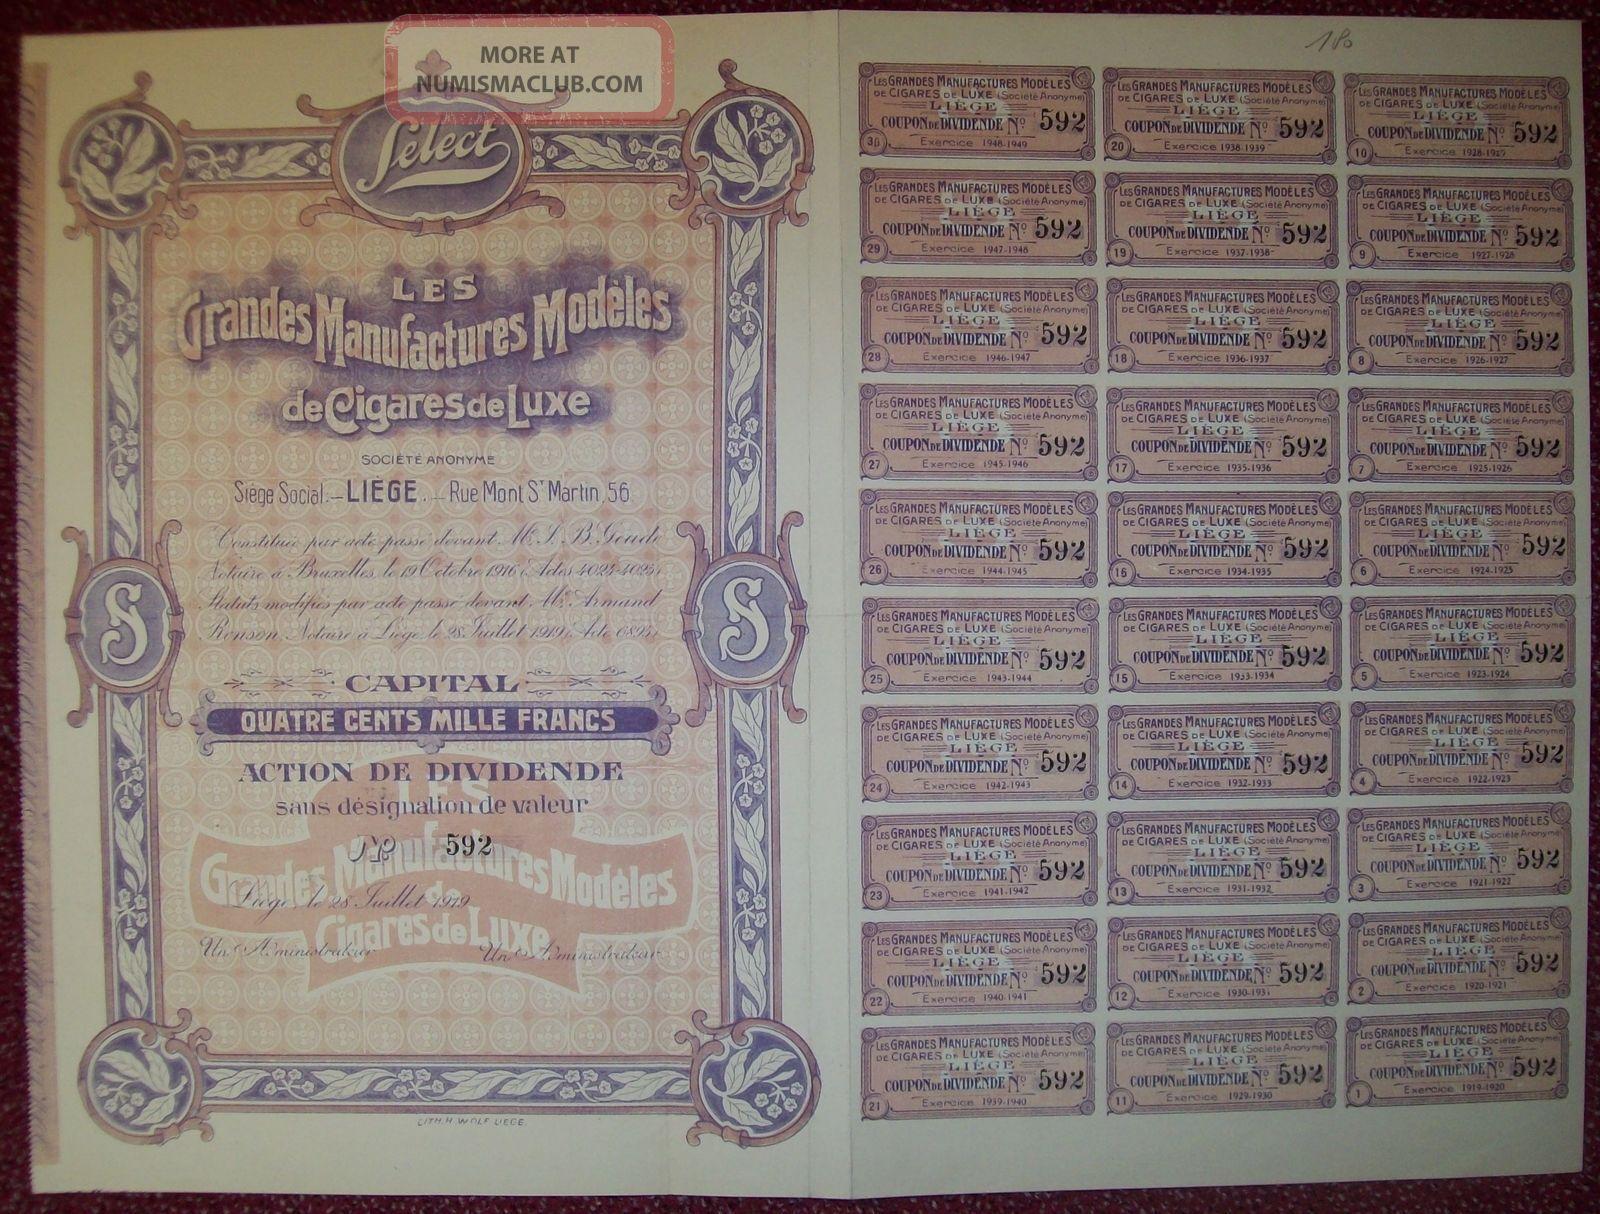 Belgium 1919 Bond - Select Manufacture De Cigares Liege - Tabac Tobacco.  R3380 World photo